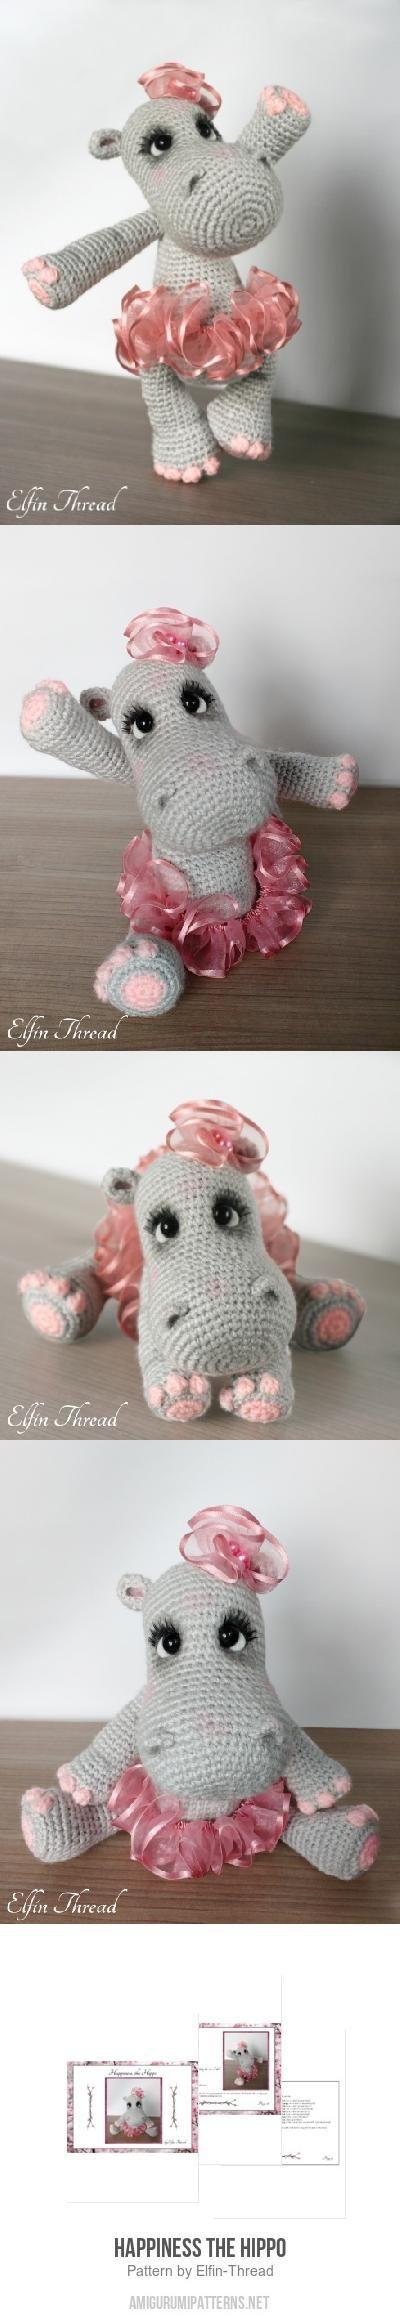 Happiness The Hippo Amigurumi Pattern